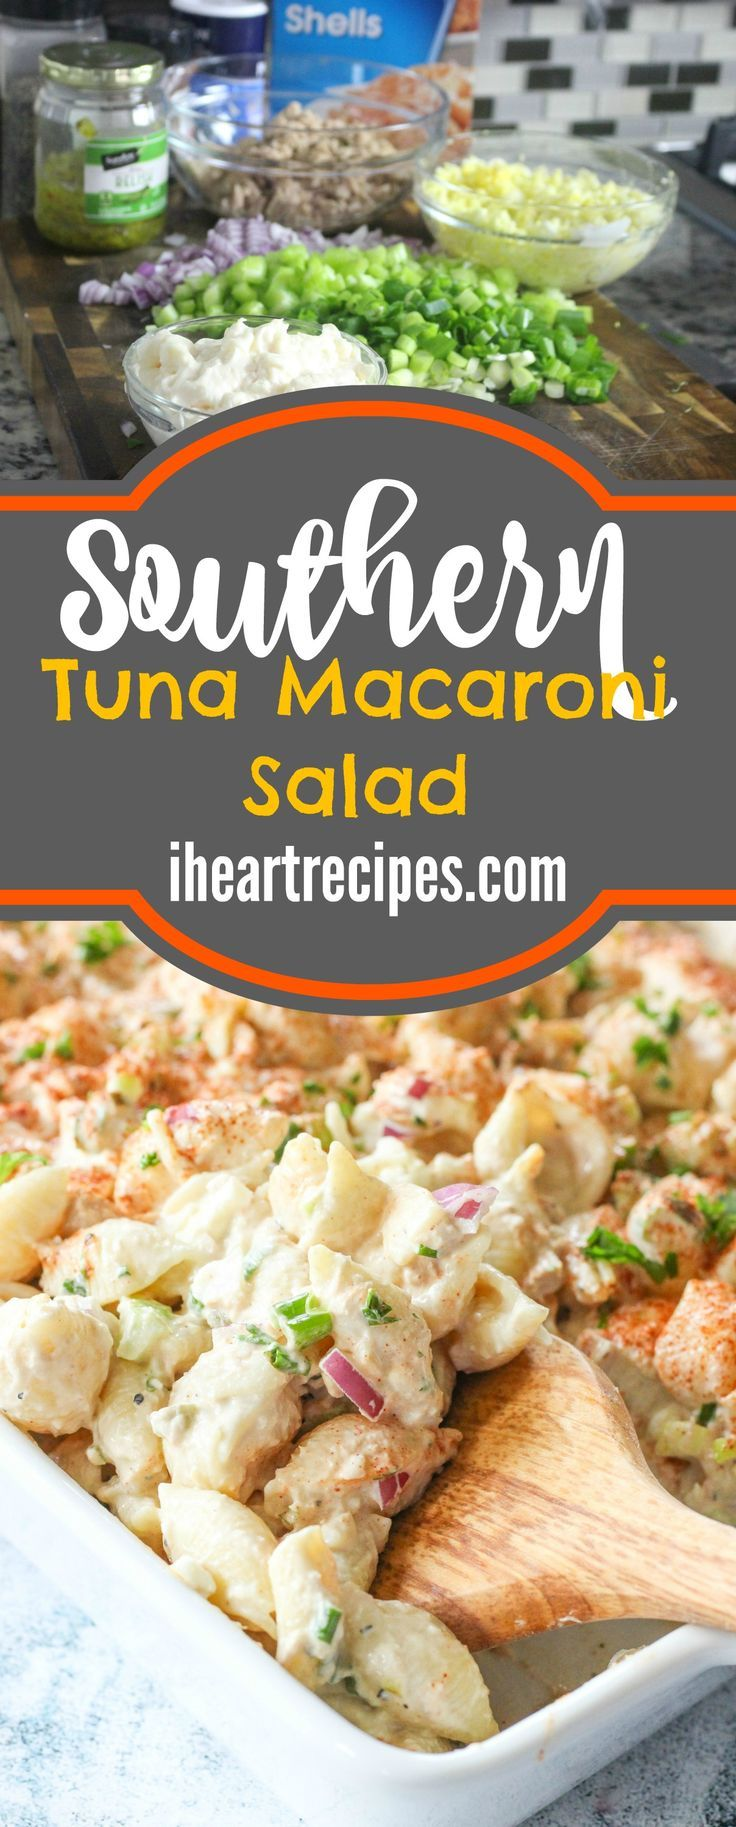 Photo of Southern Style Tuna Macaroni Salad | I Heart Recipes